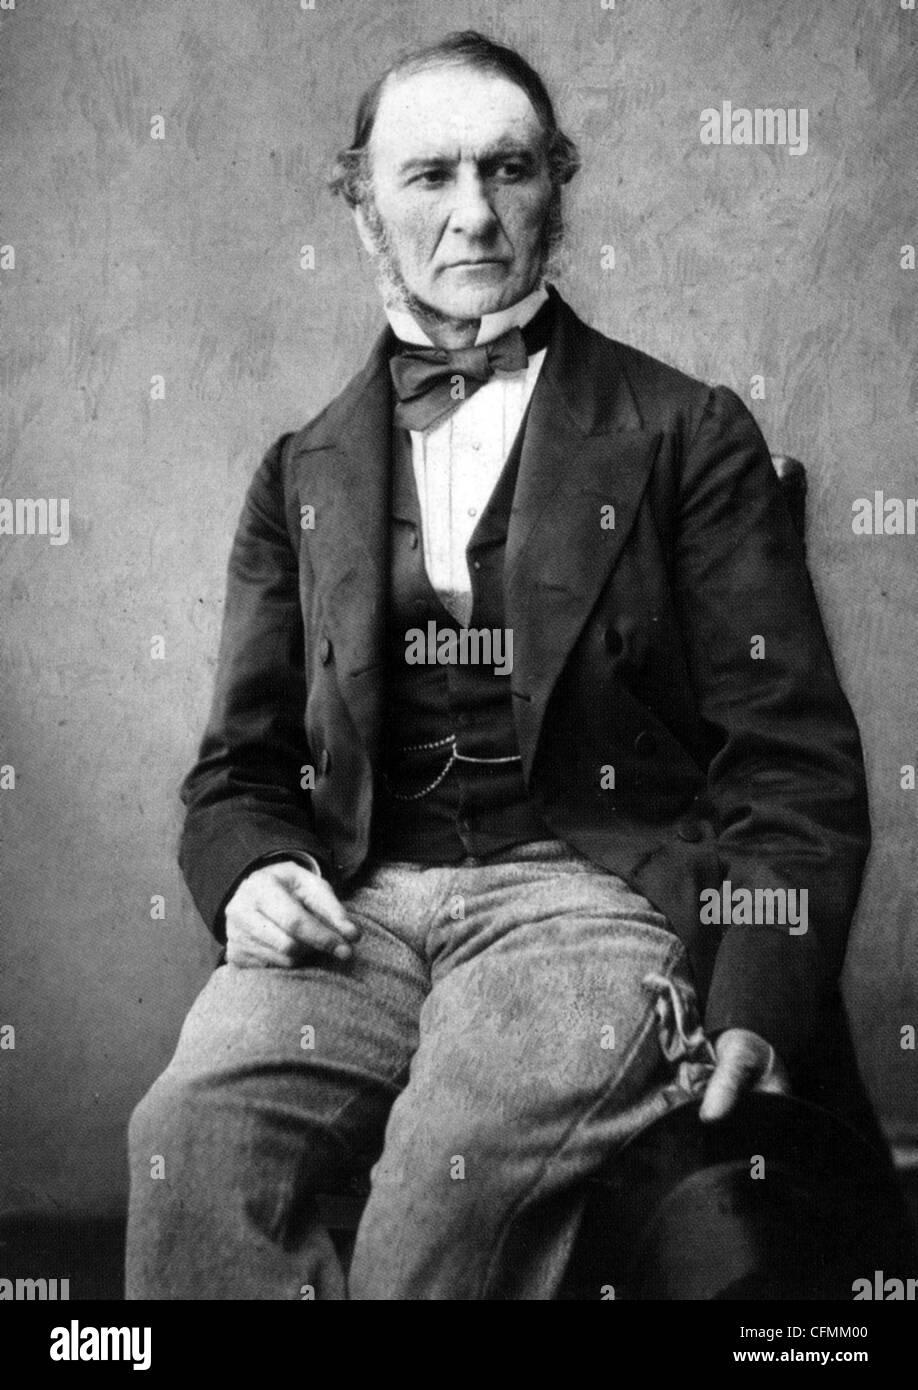 WILLIAM GLADSTONE (1809-1898) British Liberal statesman - Stock Image